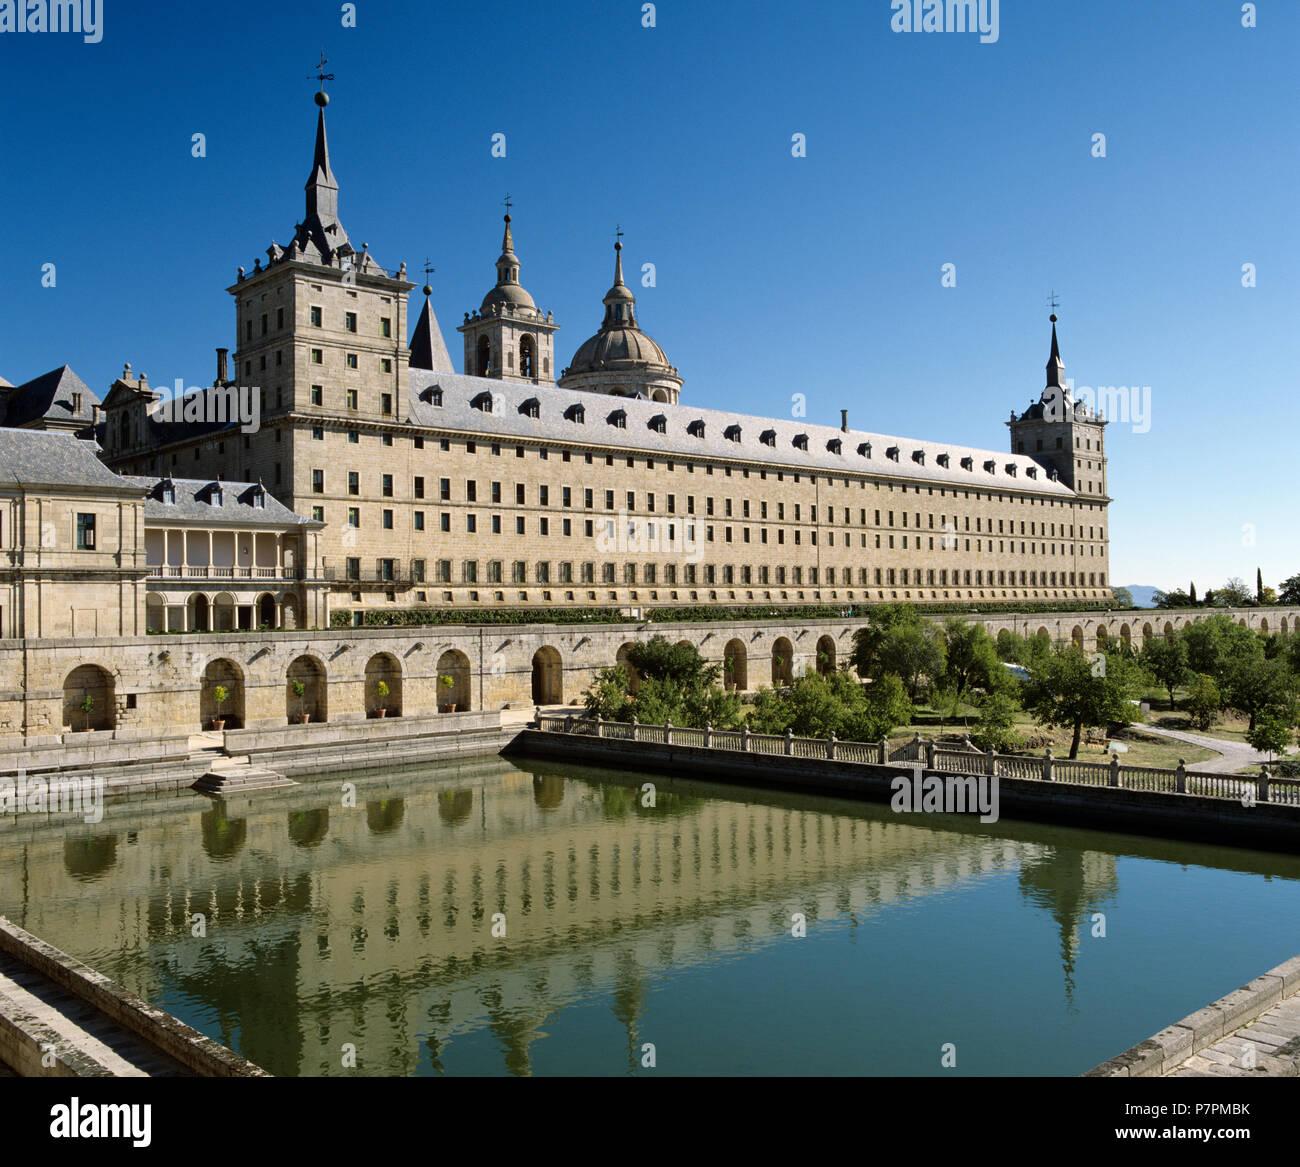 The Monastery of San Lorenzo de El Escorial, Royal Mausoleum created by King Felipe 2nd Stock Photo